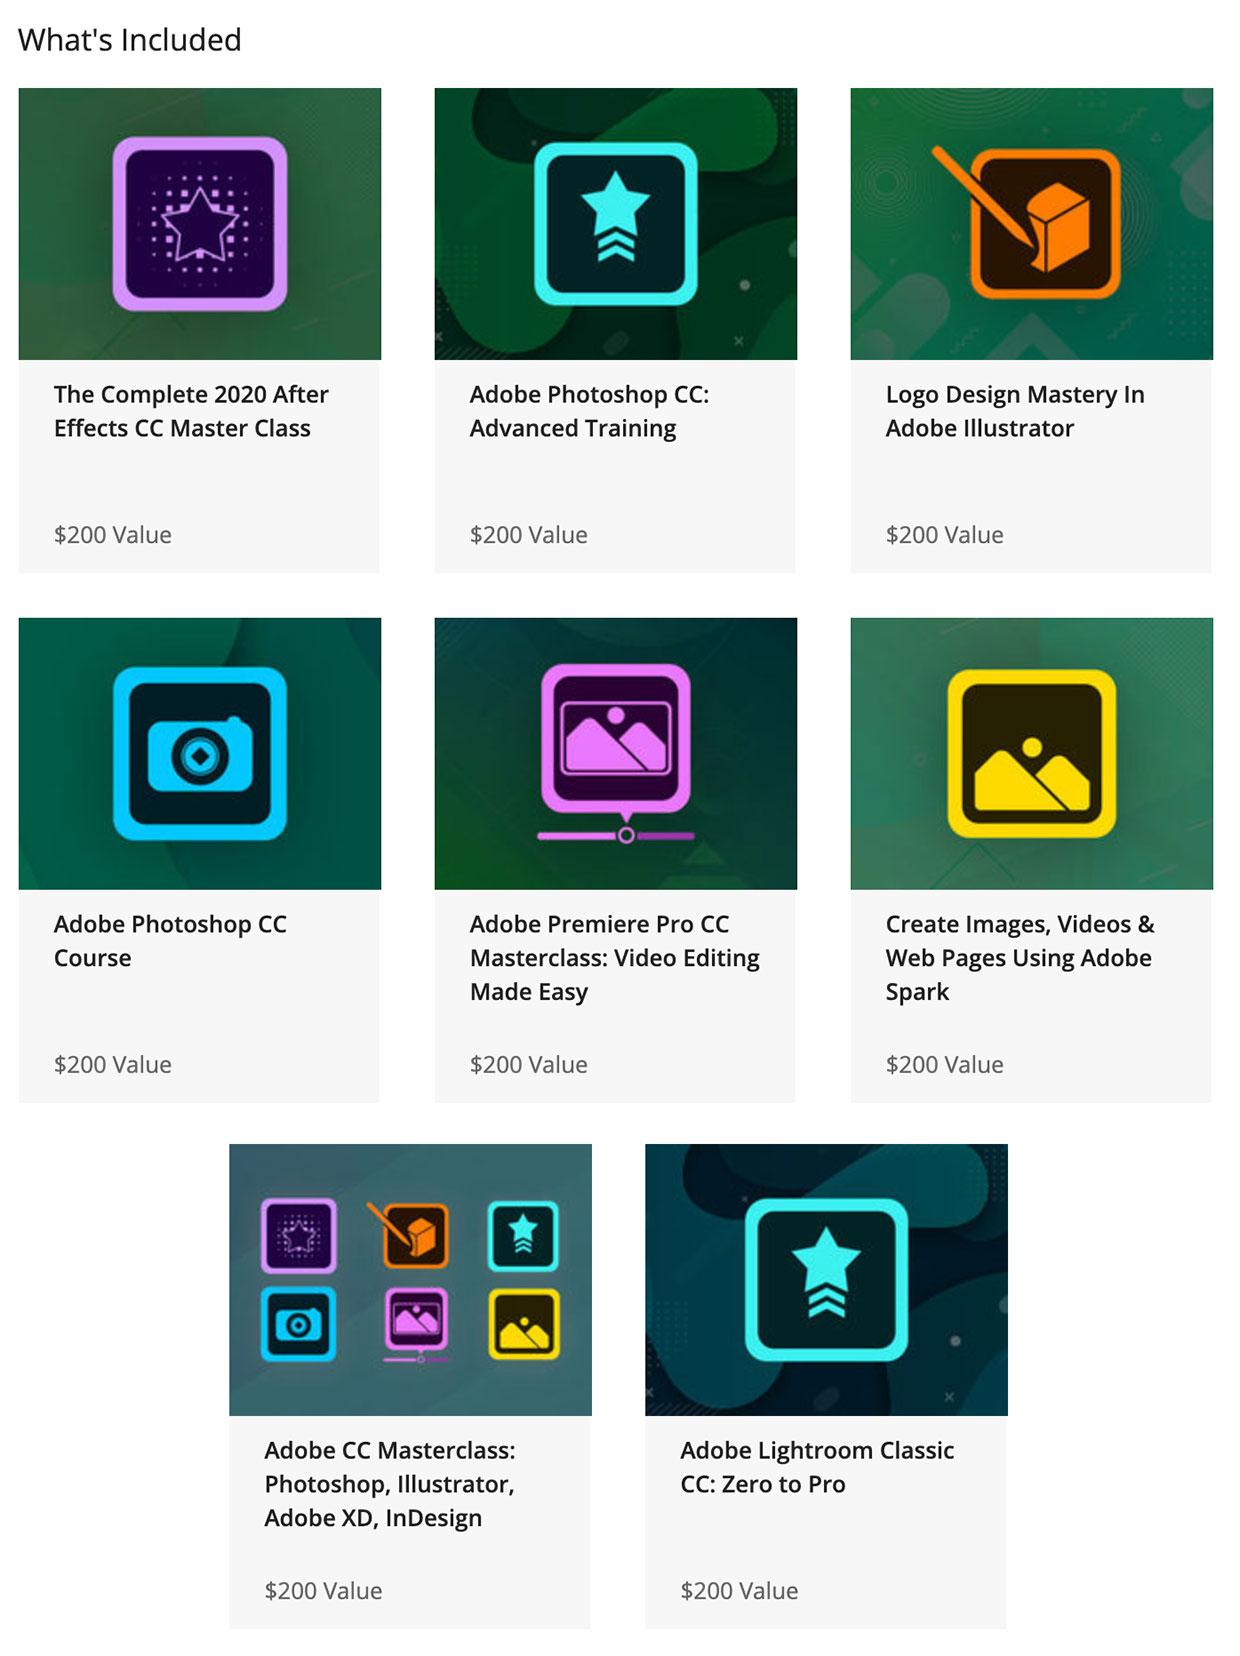 Adobe Creative Cloud Training